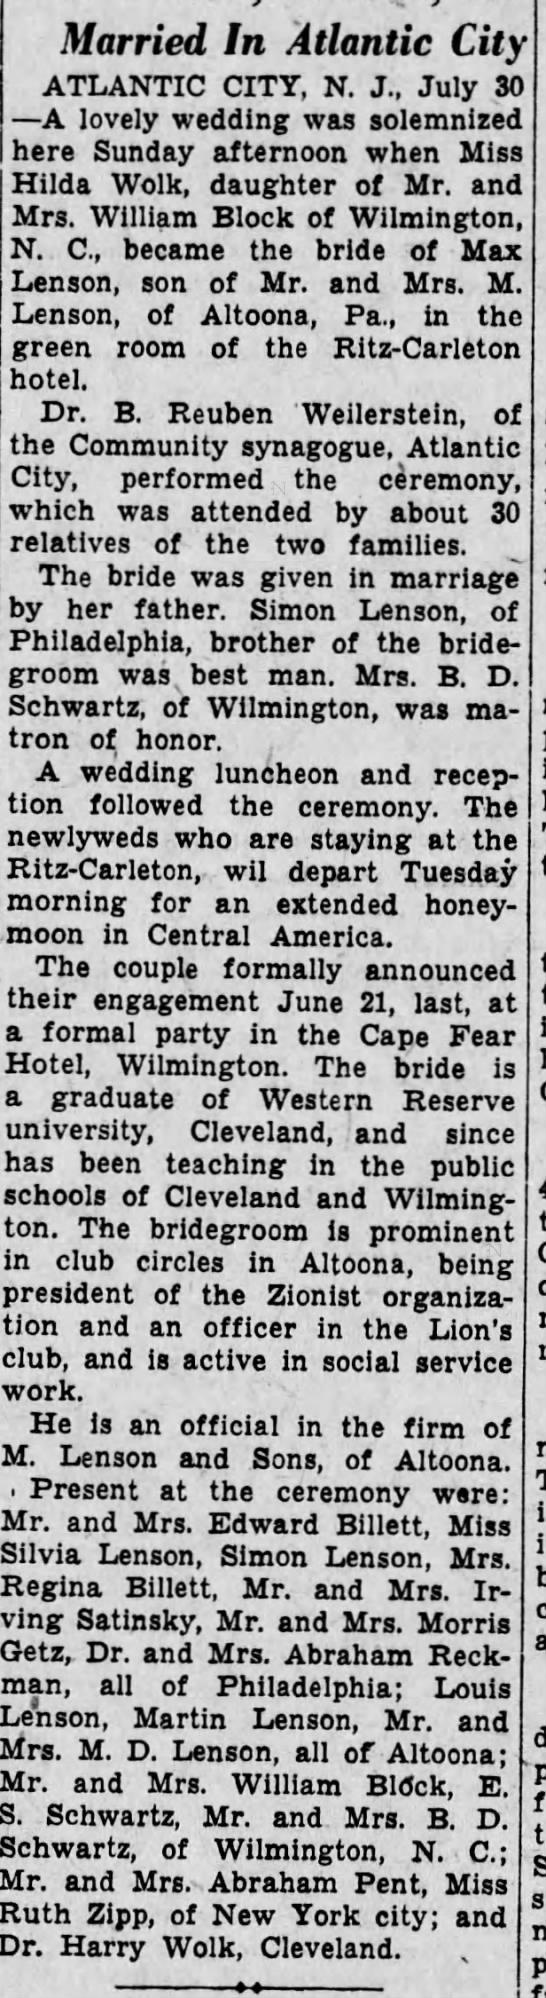 Max and Hilda's Wedding-31 July 1934 - Married In Atlantic City ATLANTIC CITT, N. J.,...